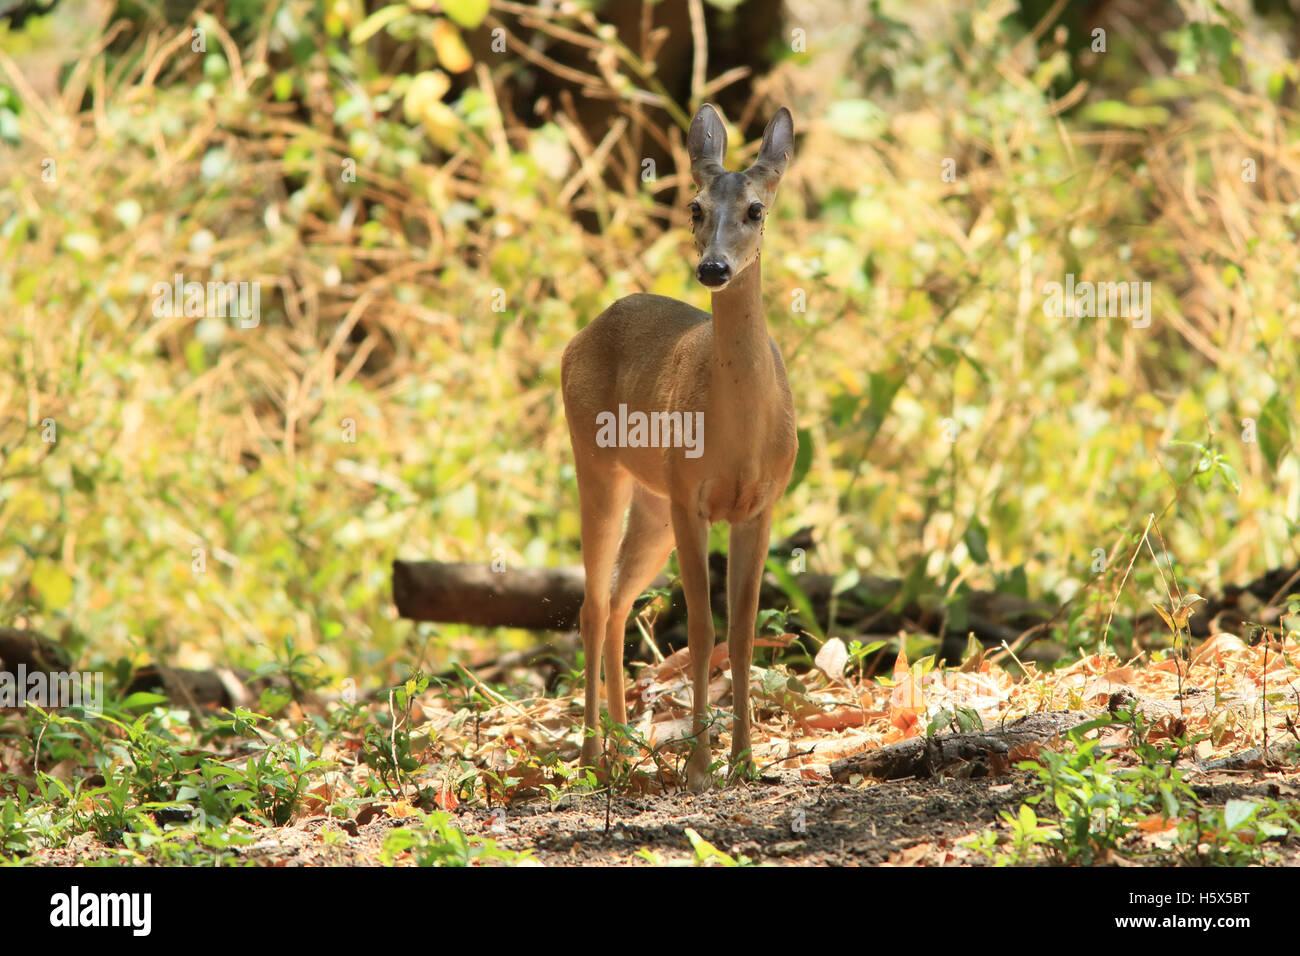 Female White-tailed deer (Odocoileus virginianus). Tropical dry forest, Palo Verde National Park, Guanacaste, Costa - Stock Image